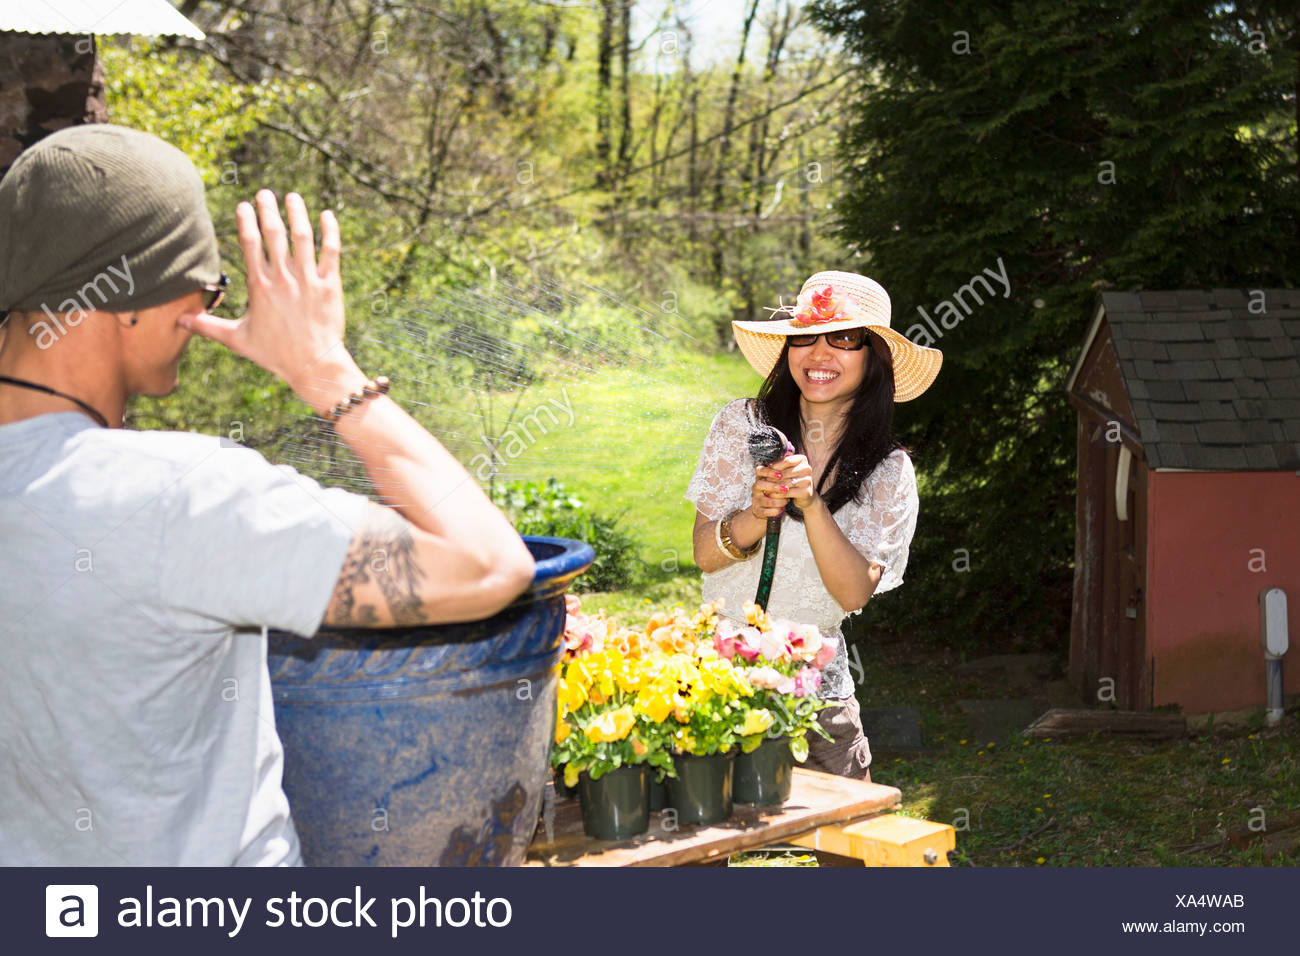 Woman spraying man with hosepipe - Stock Image